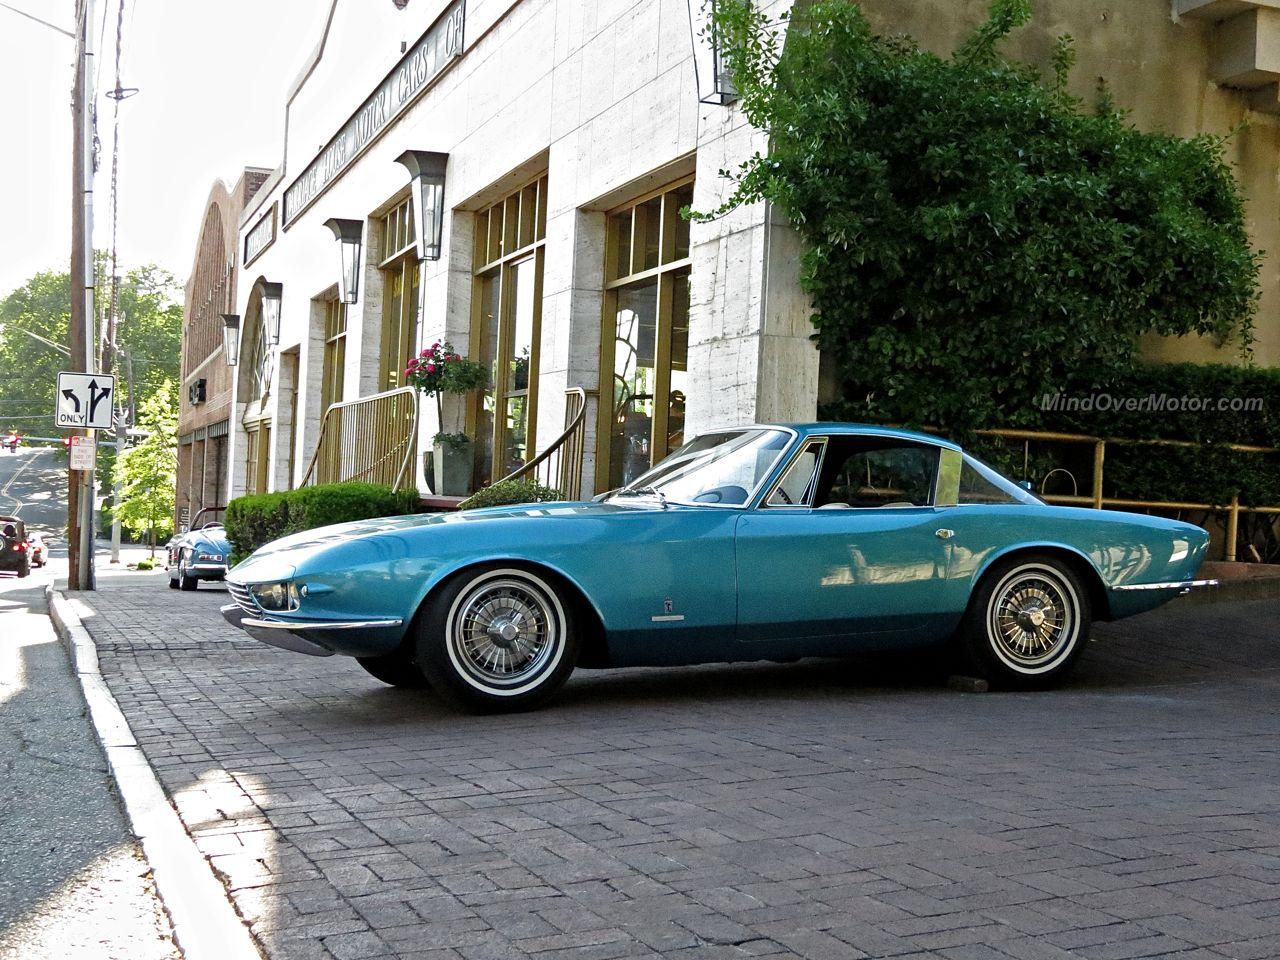 Corvette Rondine on the street in Greenwich